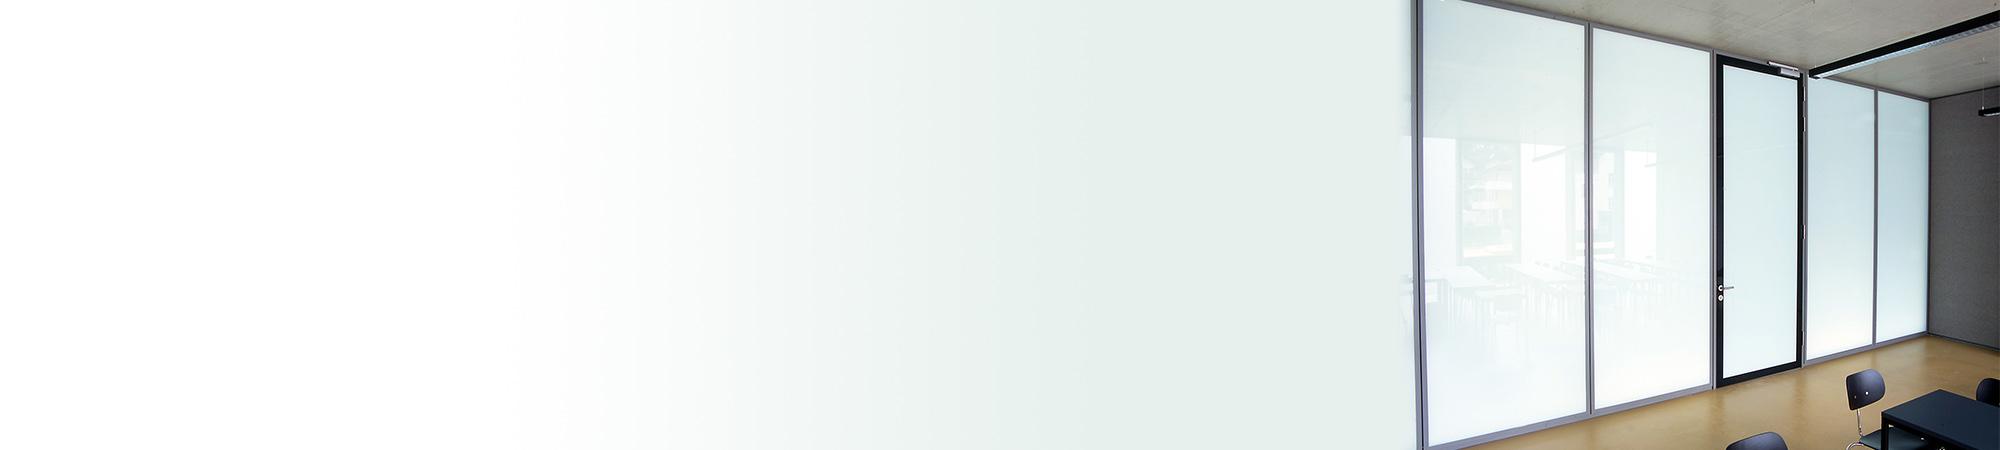 Glasverbundelemente - Küffner Aluzargen